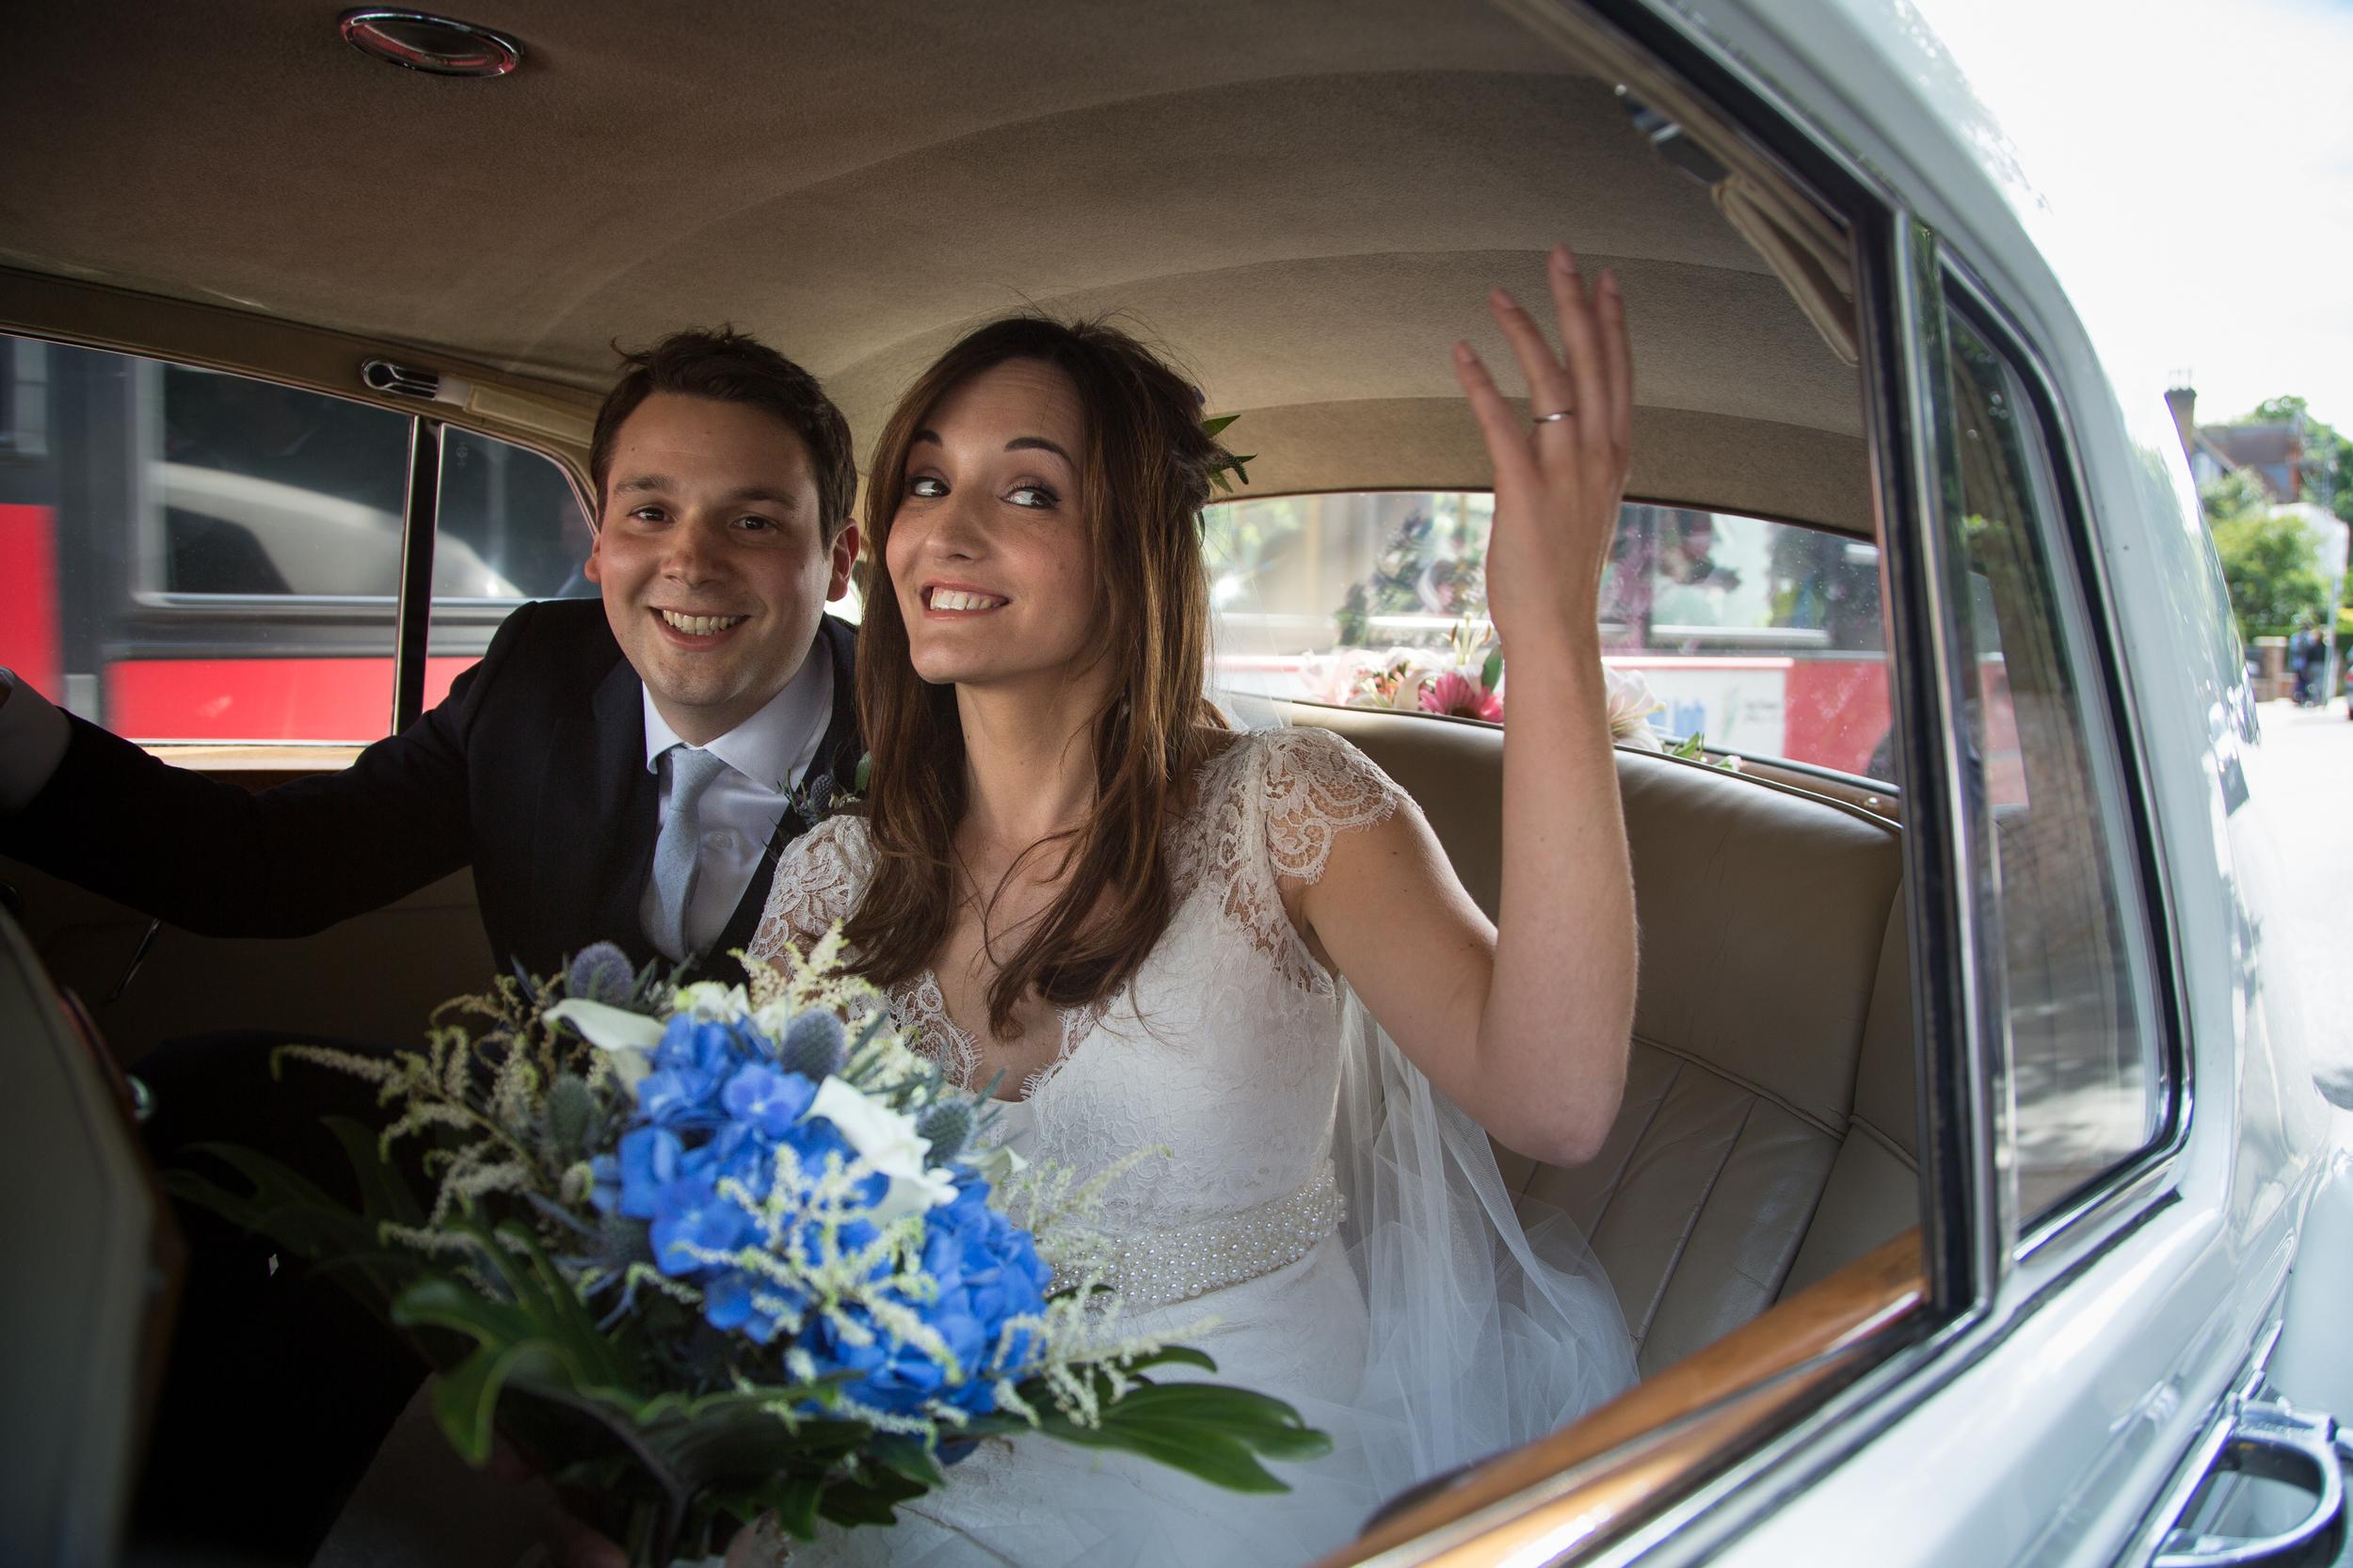 barnes-st-mary's-rolls-royce-london-uk-destination-wedding-photography-Adam-Rowley